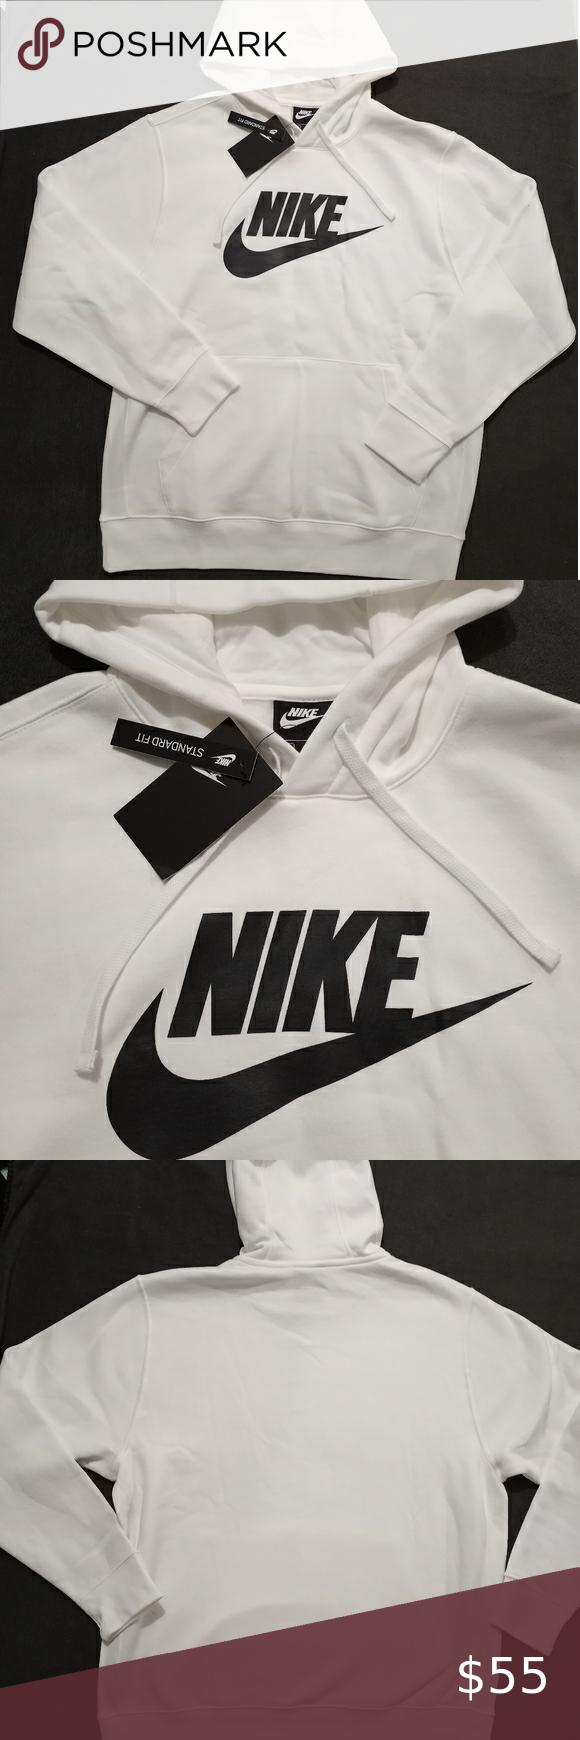 Nike Mens Hoodie Sweatshirt White Black Large Mens Sweatshirts Hoodie Sweatshirts Hoodie Hoodies Men [ 1740 x 580 Pixel ]